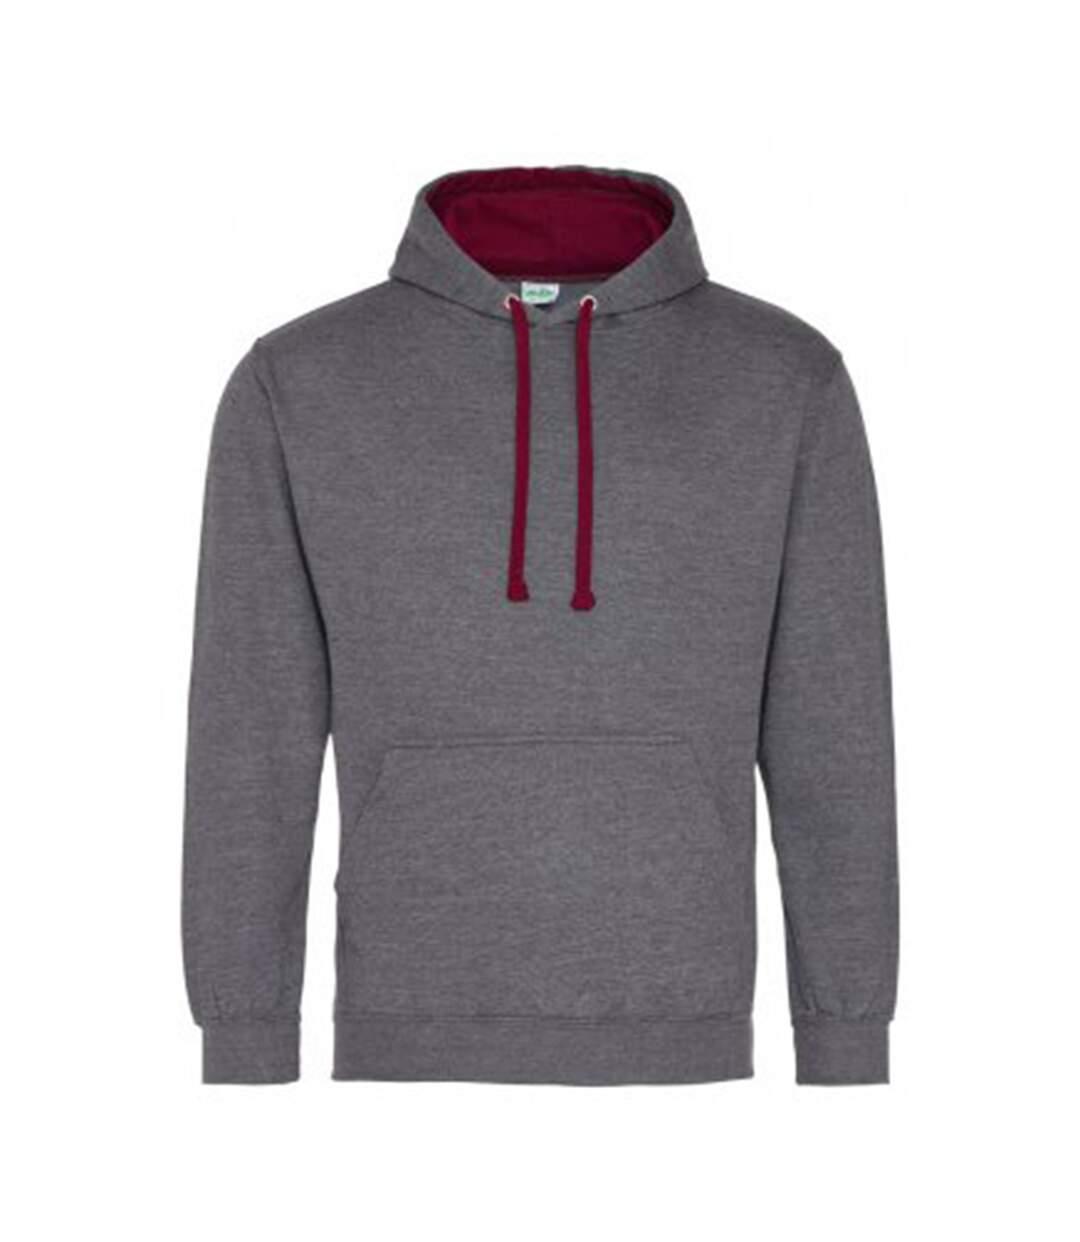 Awdis Varsity Hooded Sweatshirt / Hoodie (Hot Pink / French Navy) - UTRW165